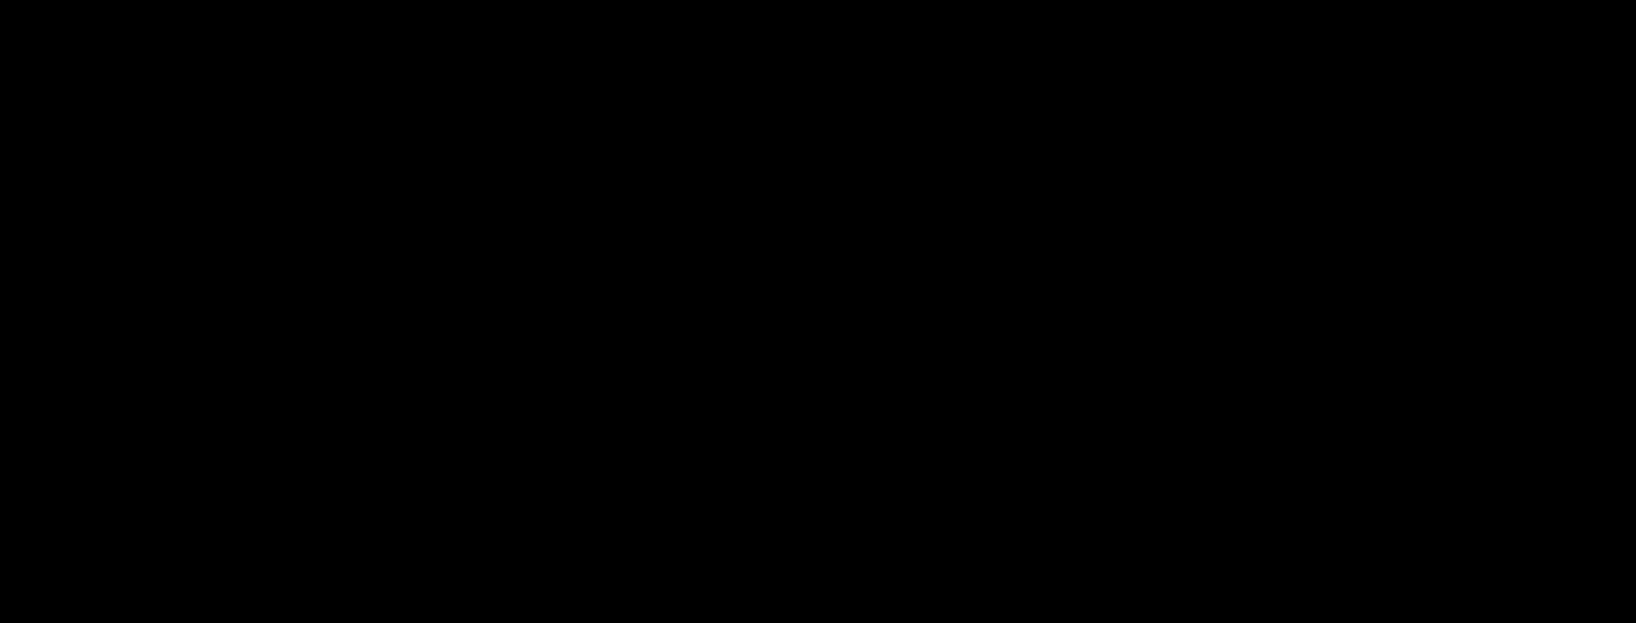 метиленово синьо химична структура